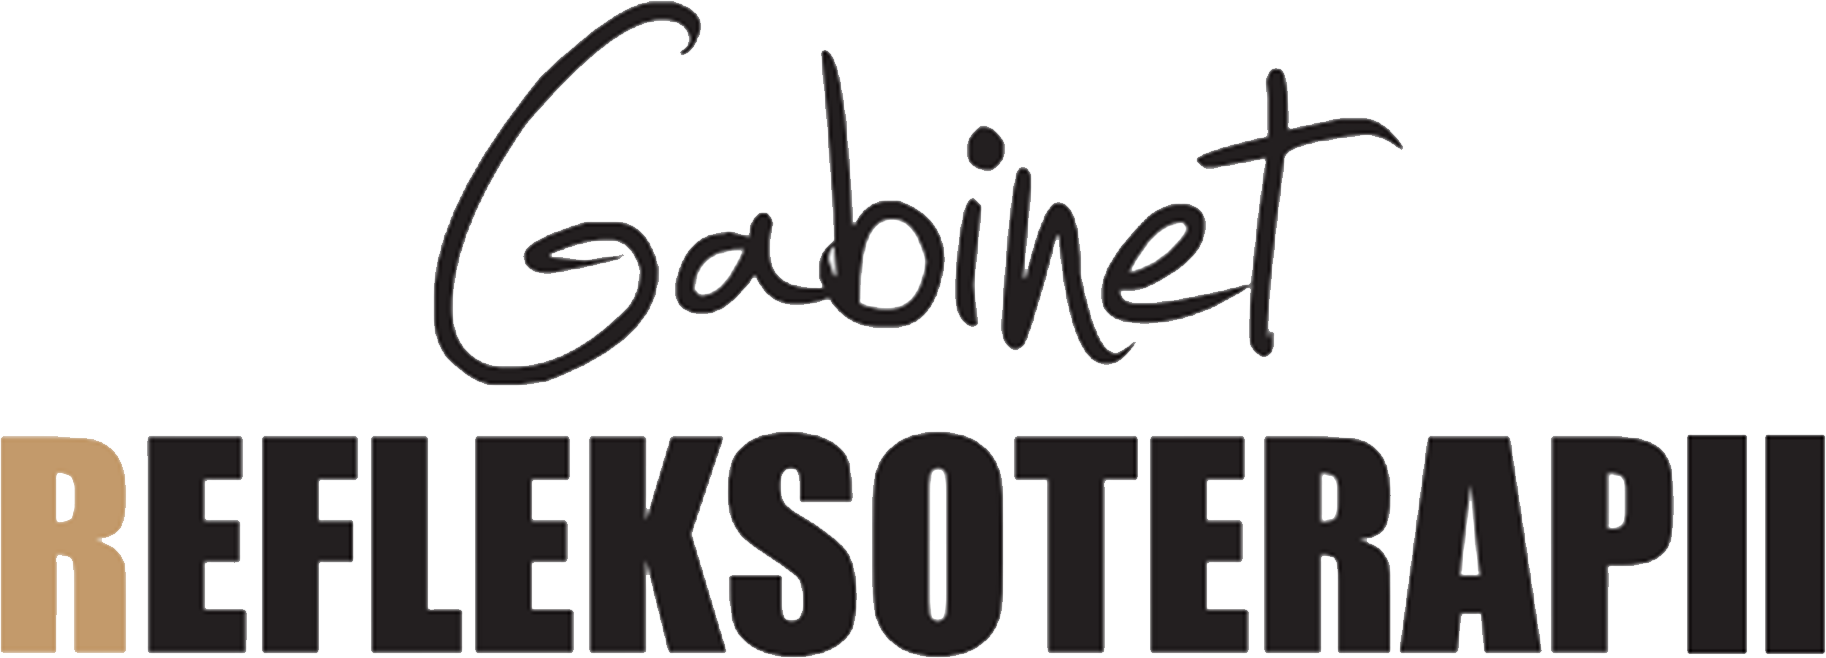 Refleksoterapia Siedlce - dr Jan Jaroszyński